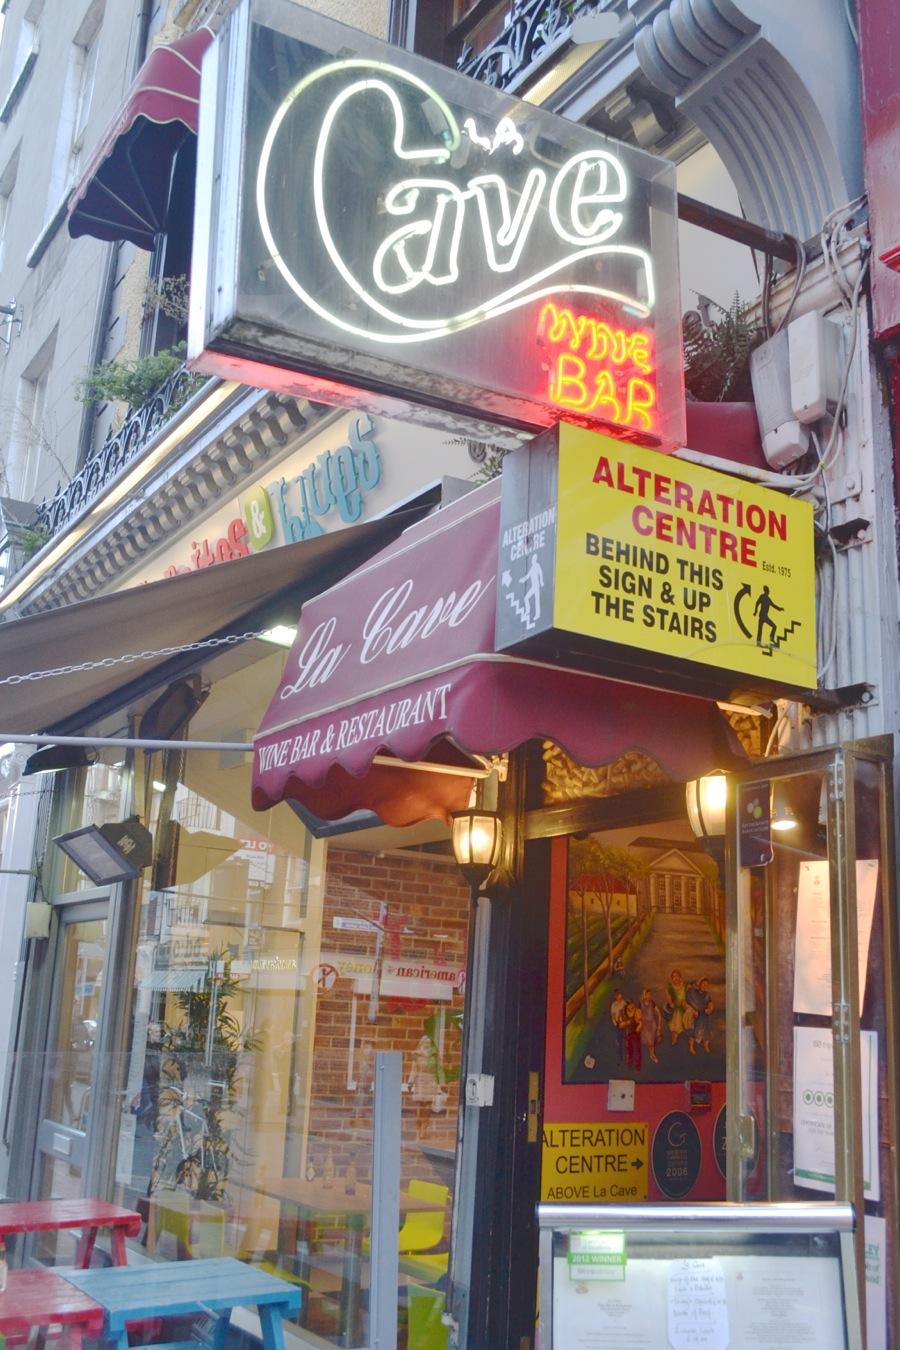 la cave wine bar restaurant dublin south anne street french